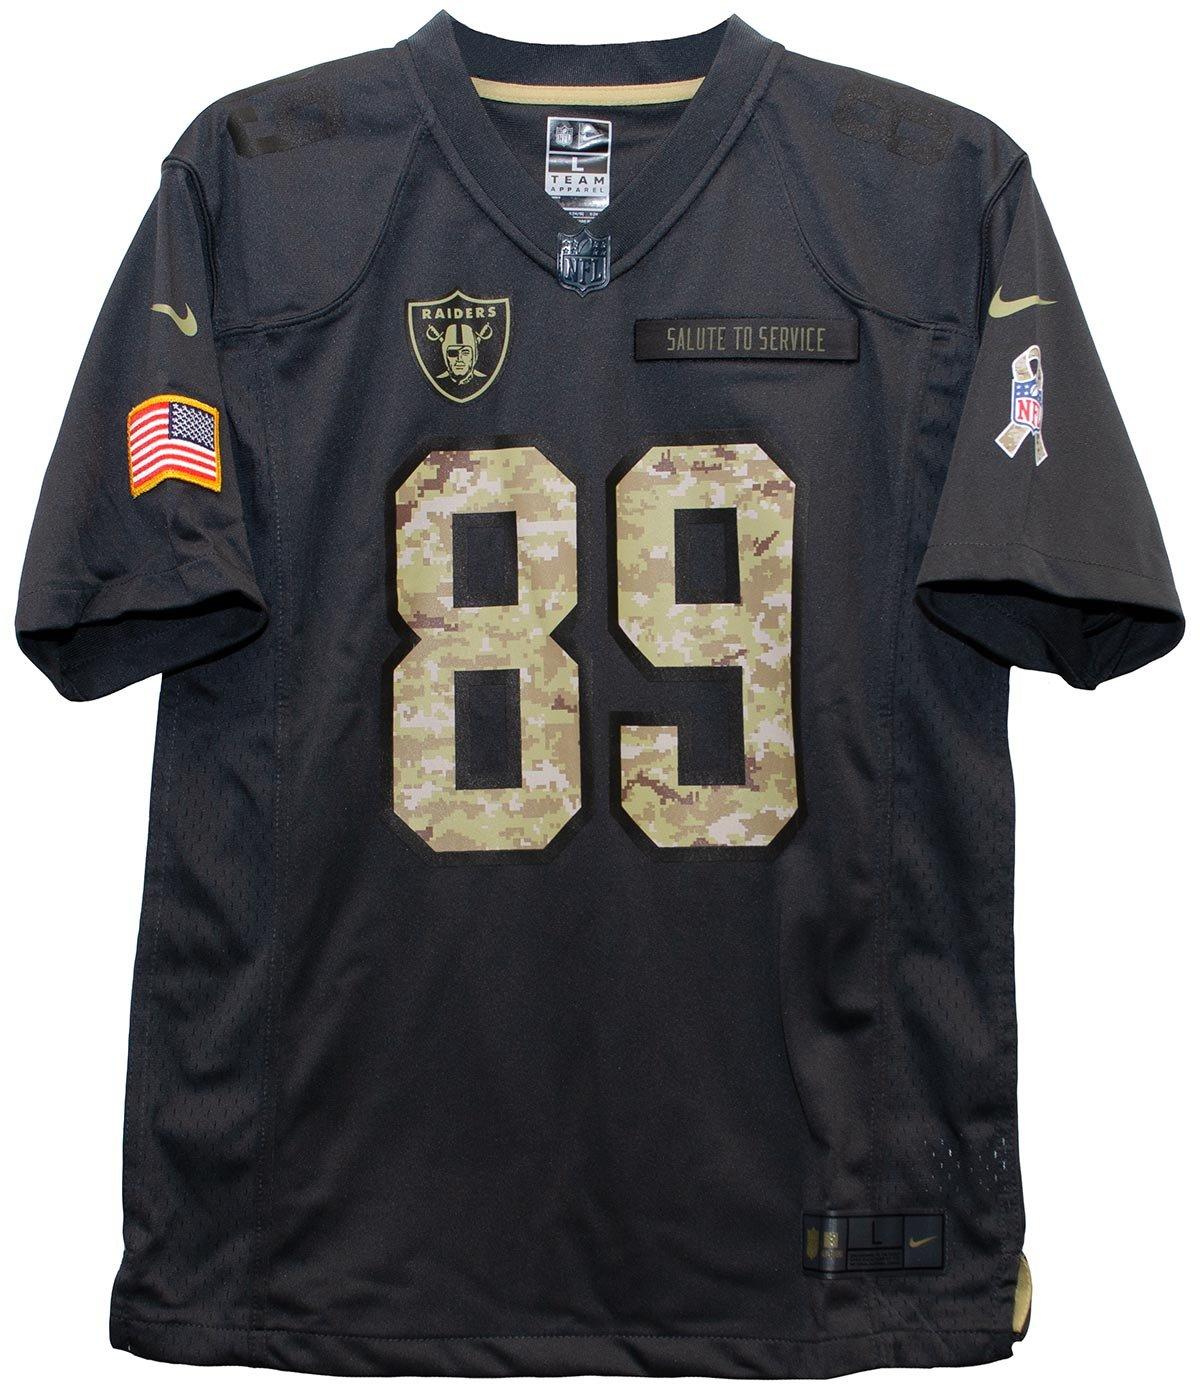 check out 23f7e 7eda9 Amazon.com : NIKE Amari Cooper Oakland Raiders Salute to ...